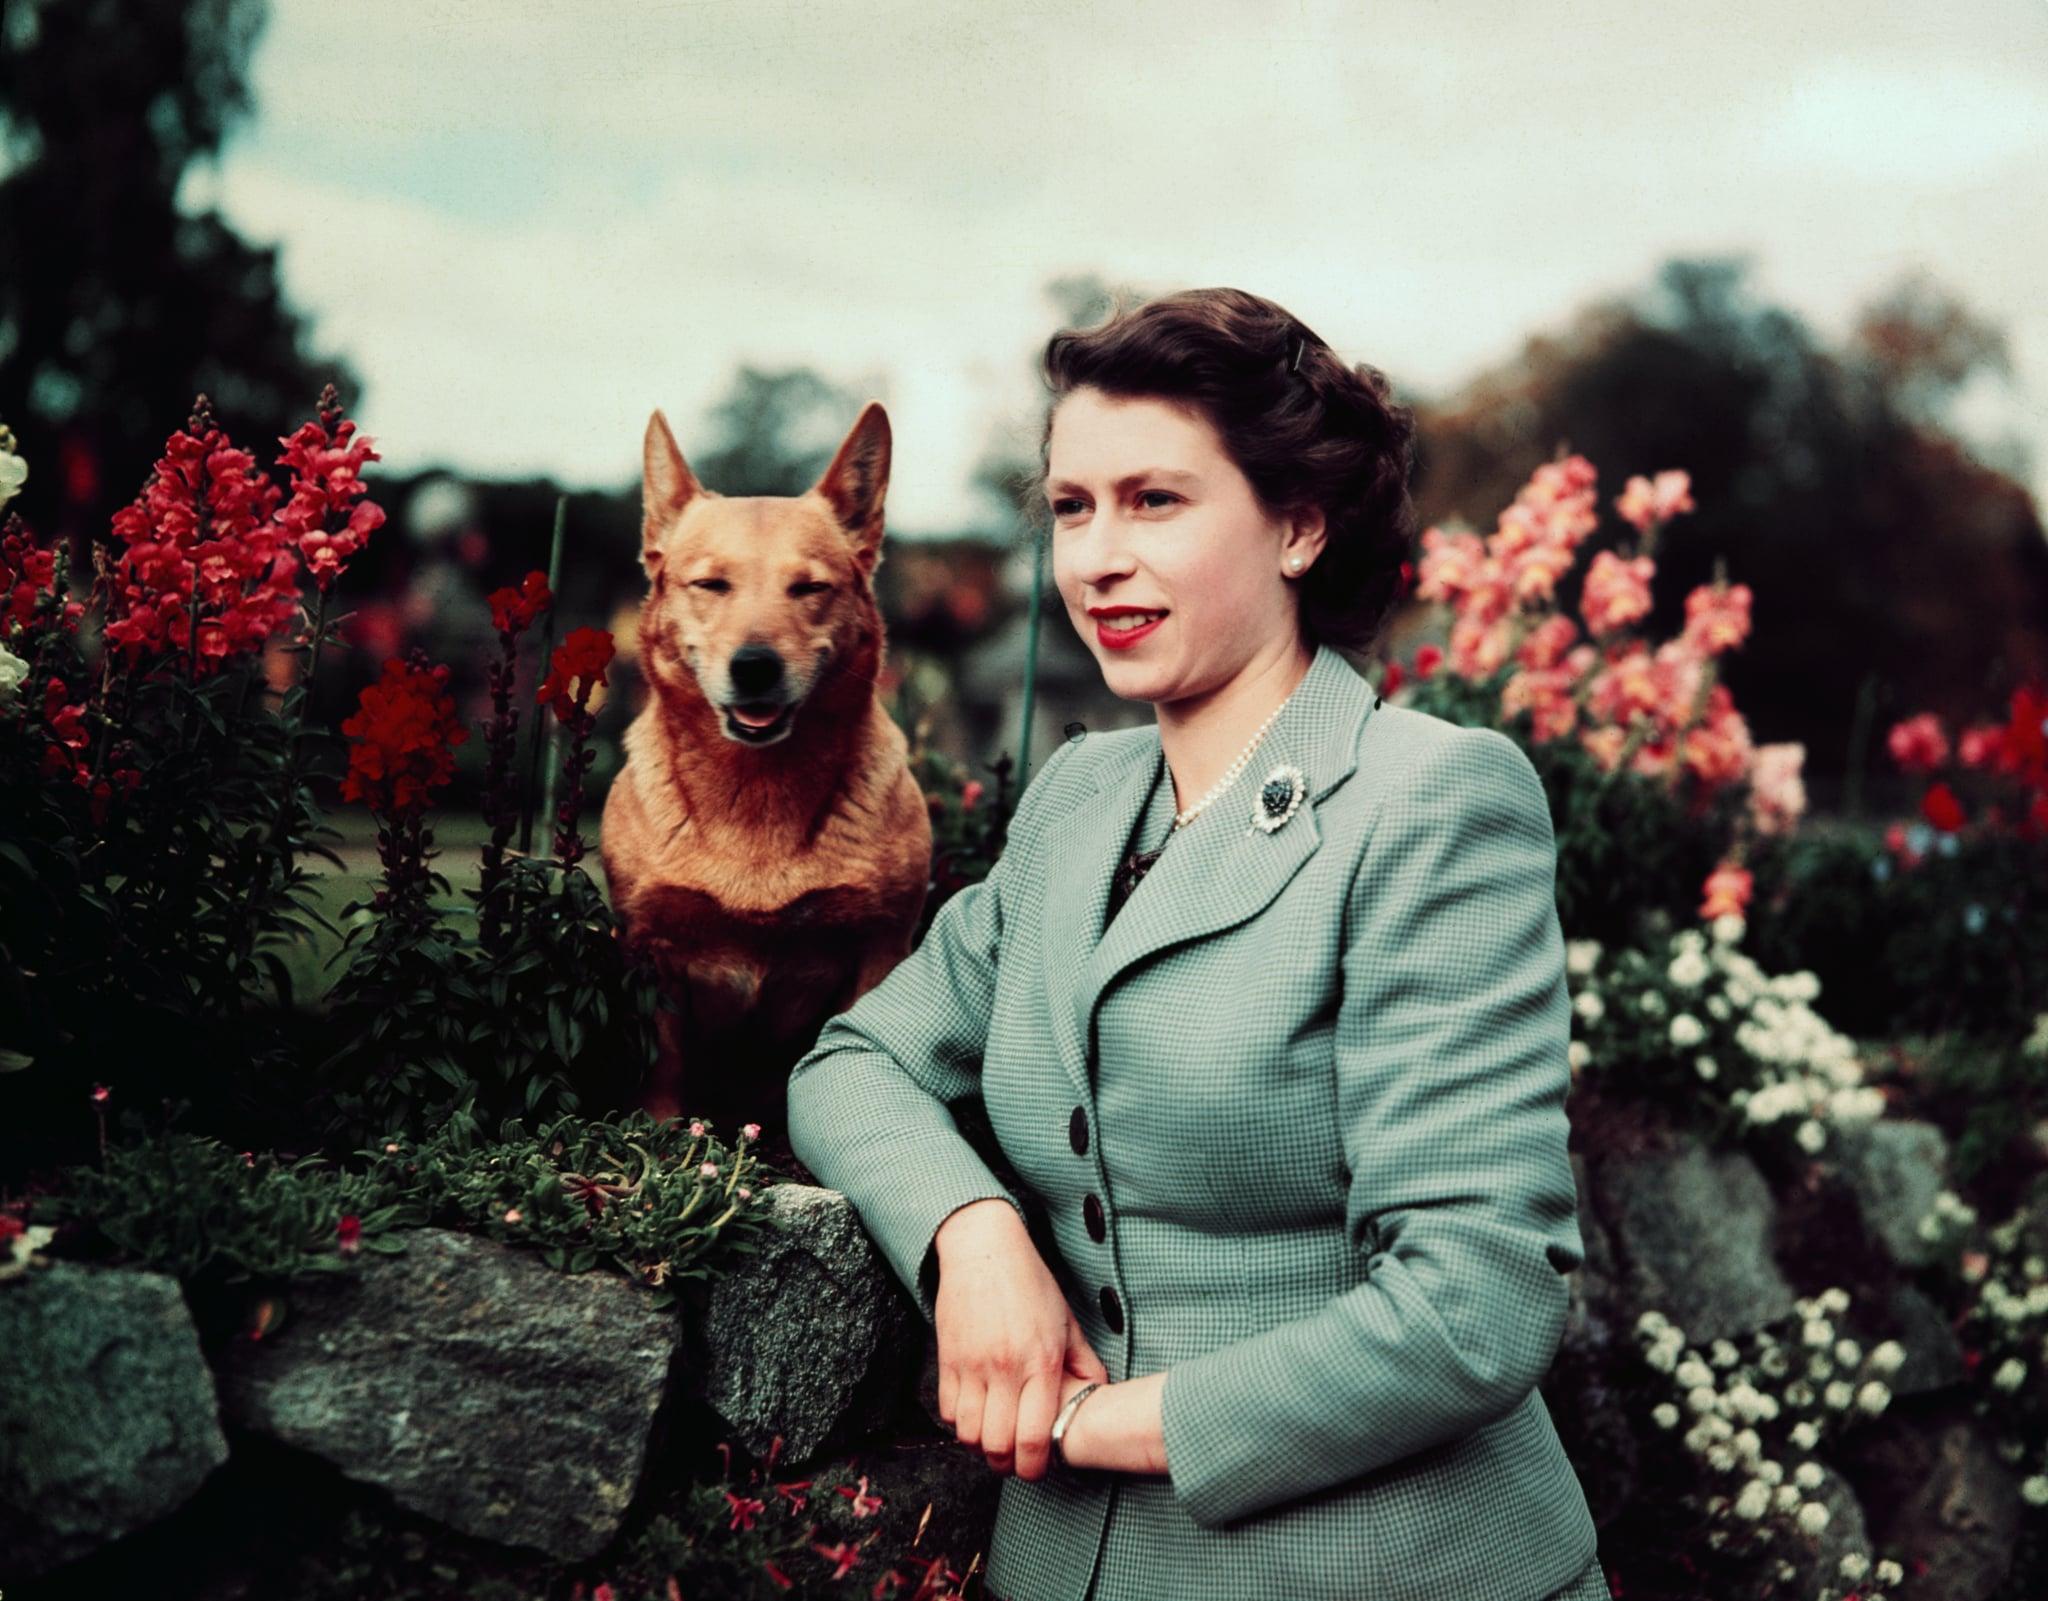 March,1953- Queen Elizabeth II of England--closeup in garden with dog. UPI color slide.